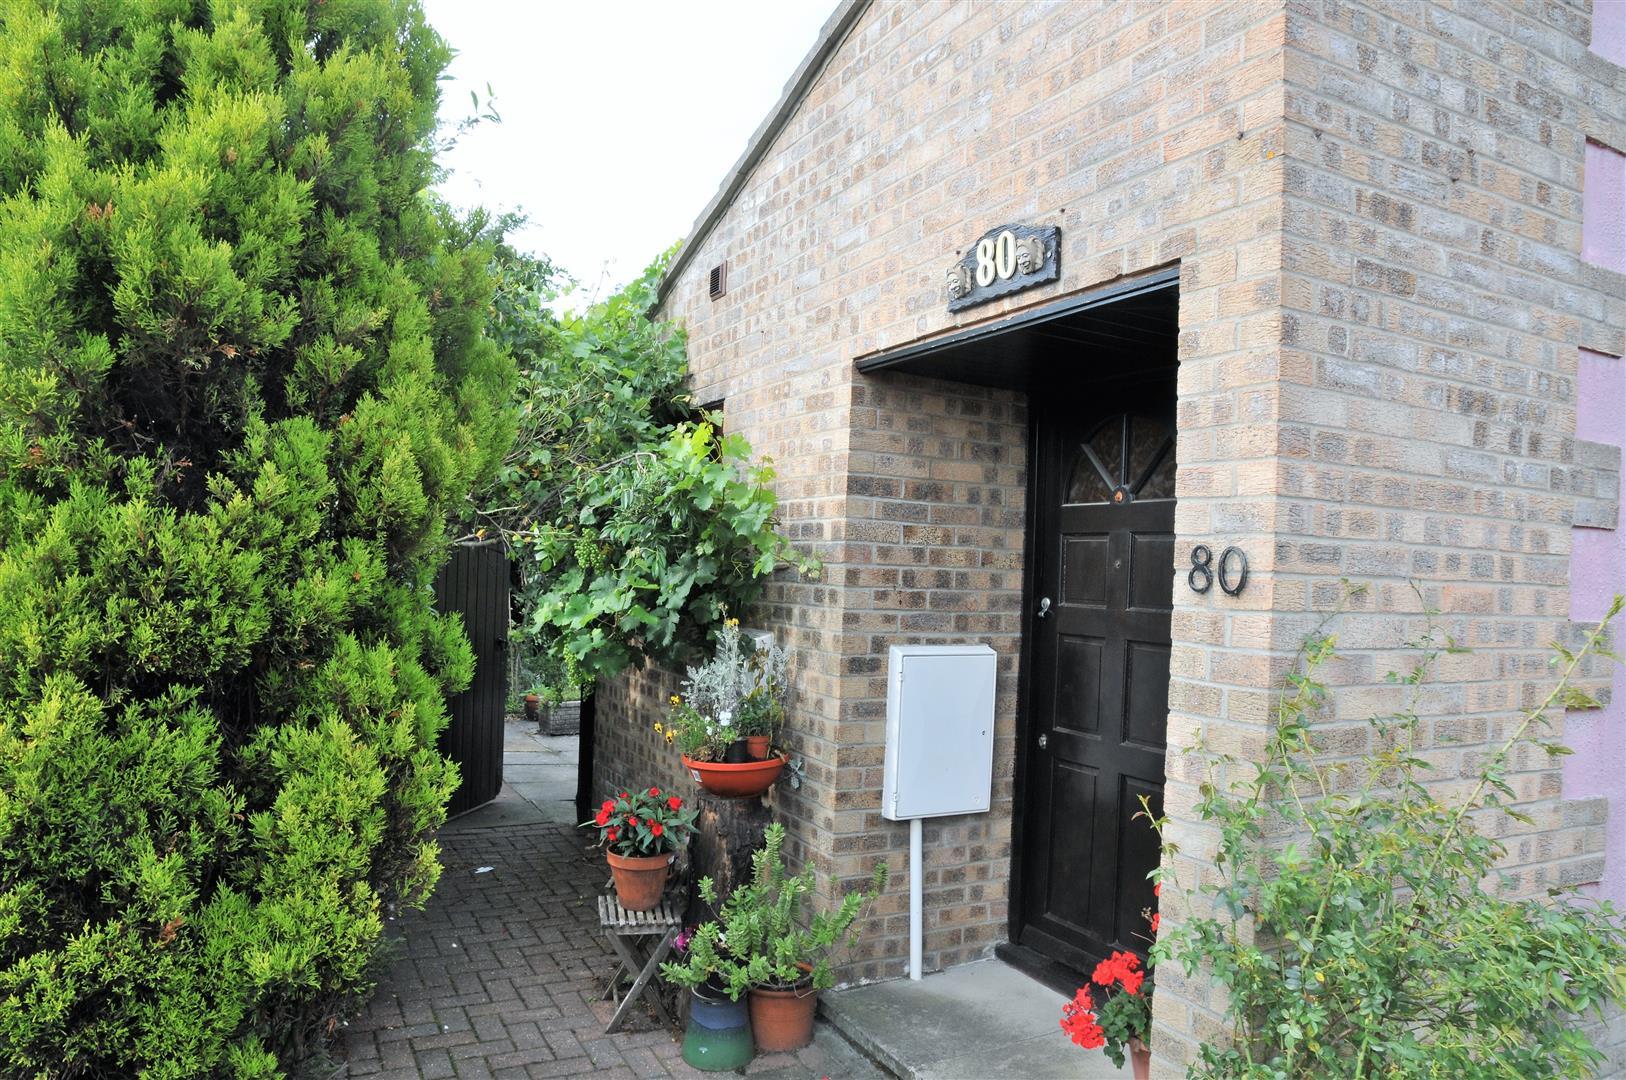 80 Finchfield, Peterborough